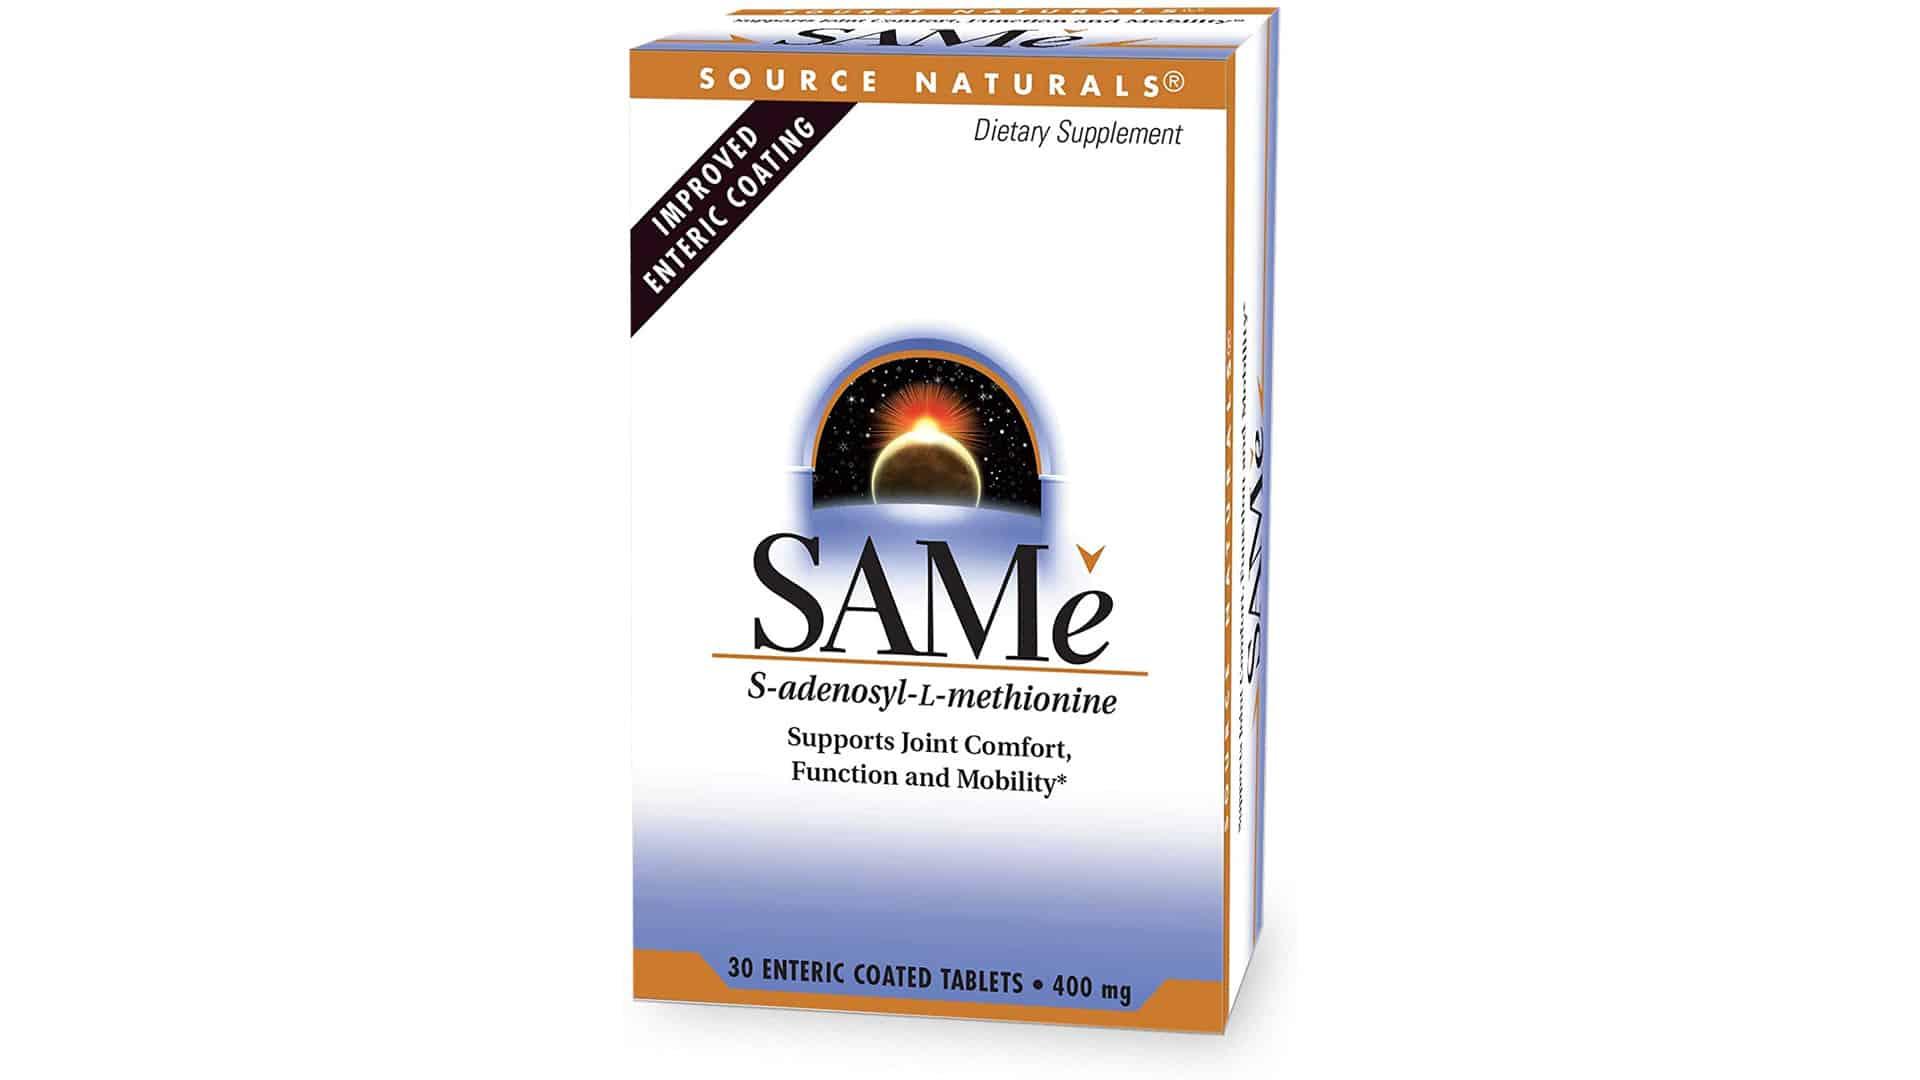 Source Naturals Double Strength SAM-e